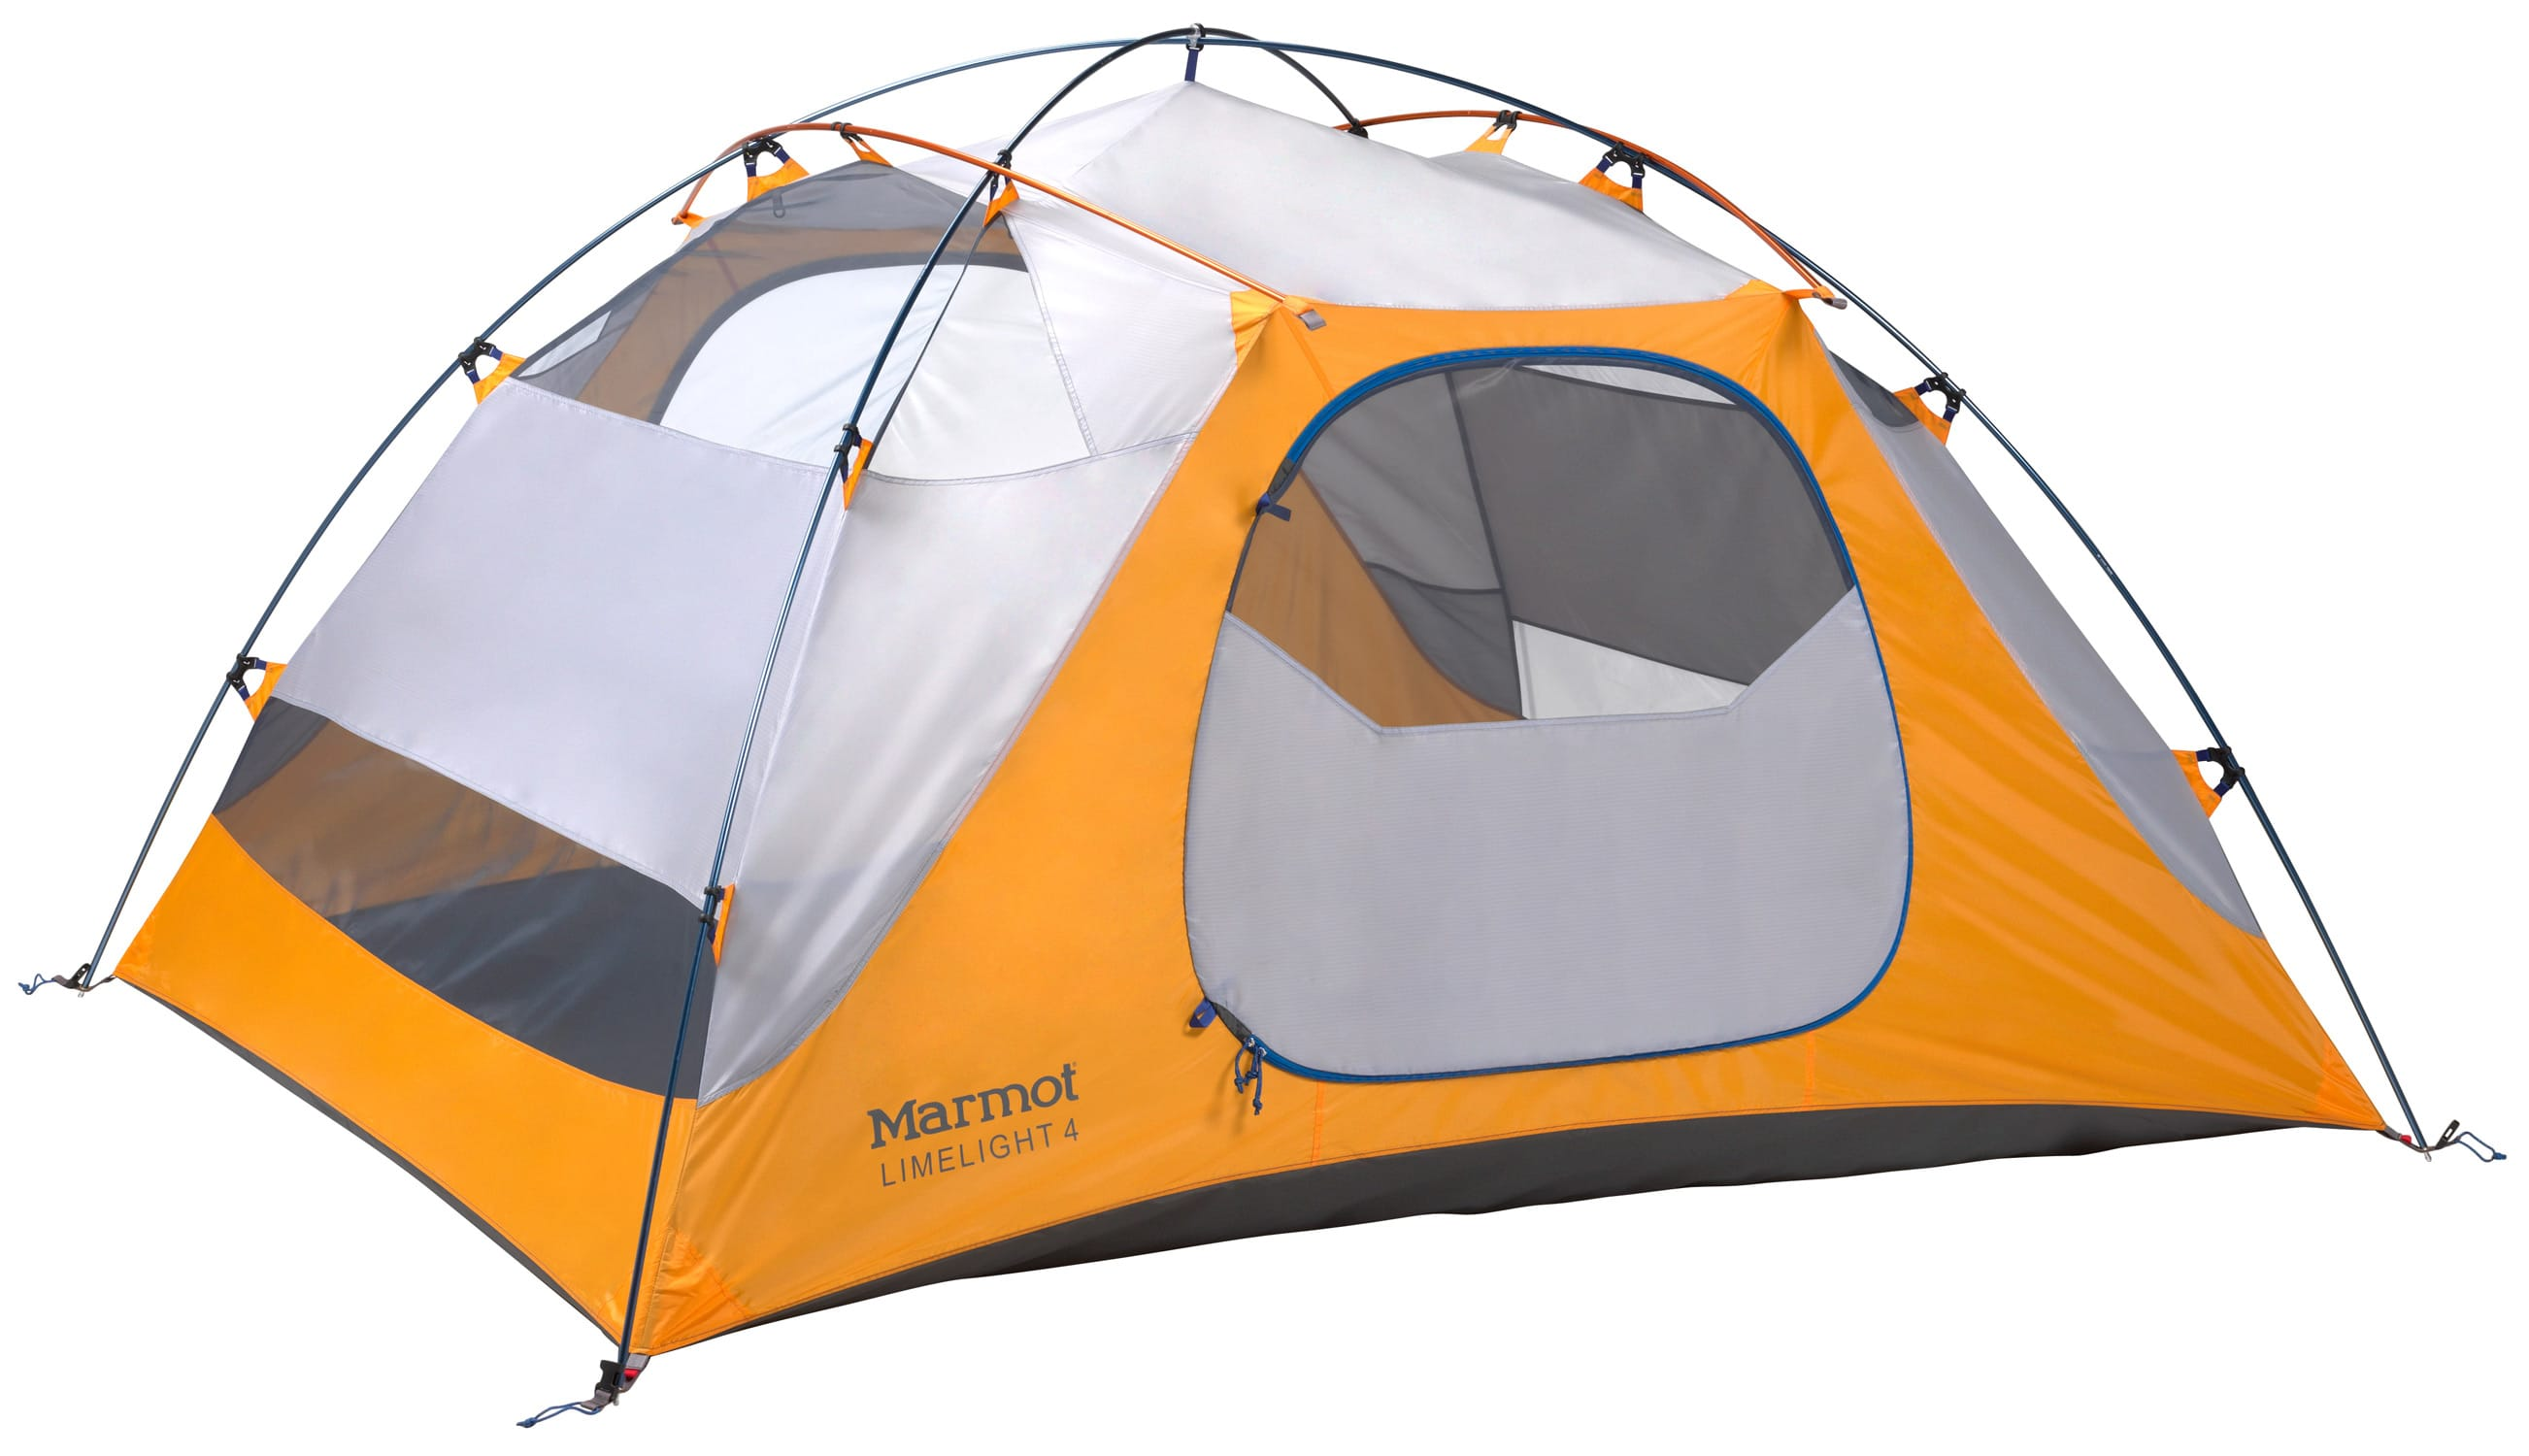 Marmot Limelight 4 Person Tent - thumbnail 1  sc 1 st  The House & On Sale Marmot Limelight 4 Person Tent up to 50% off